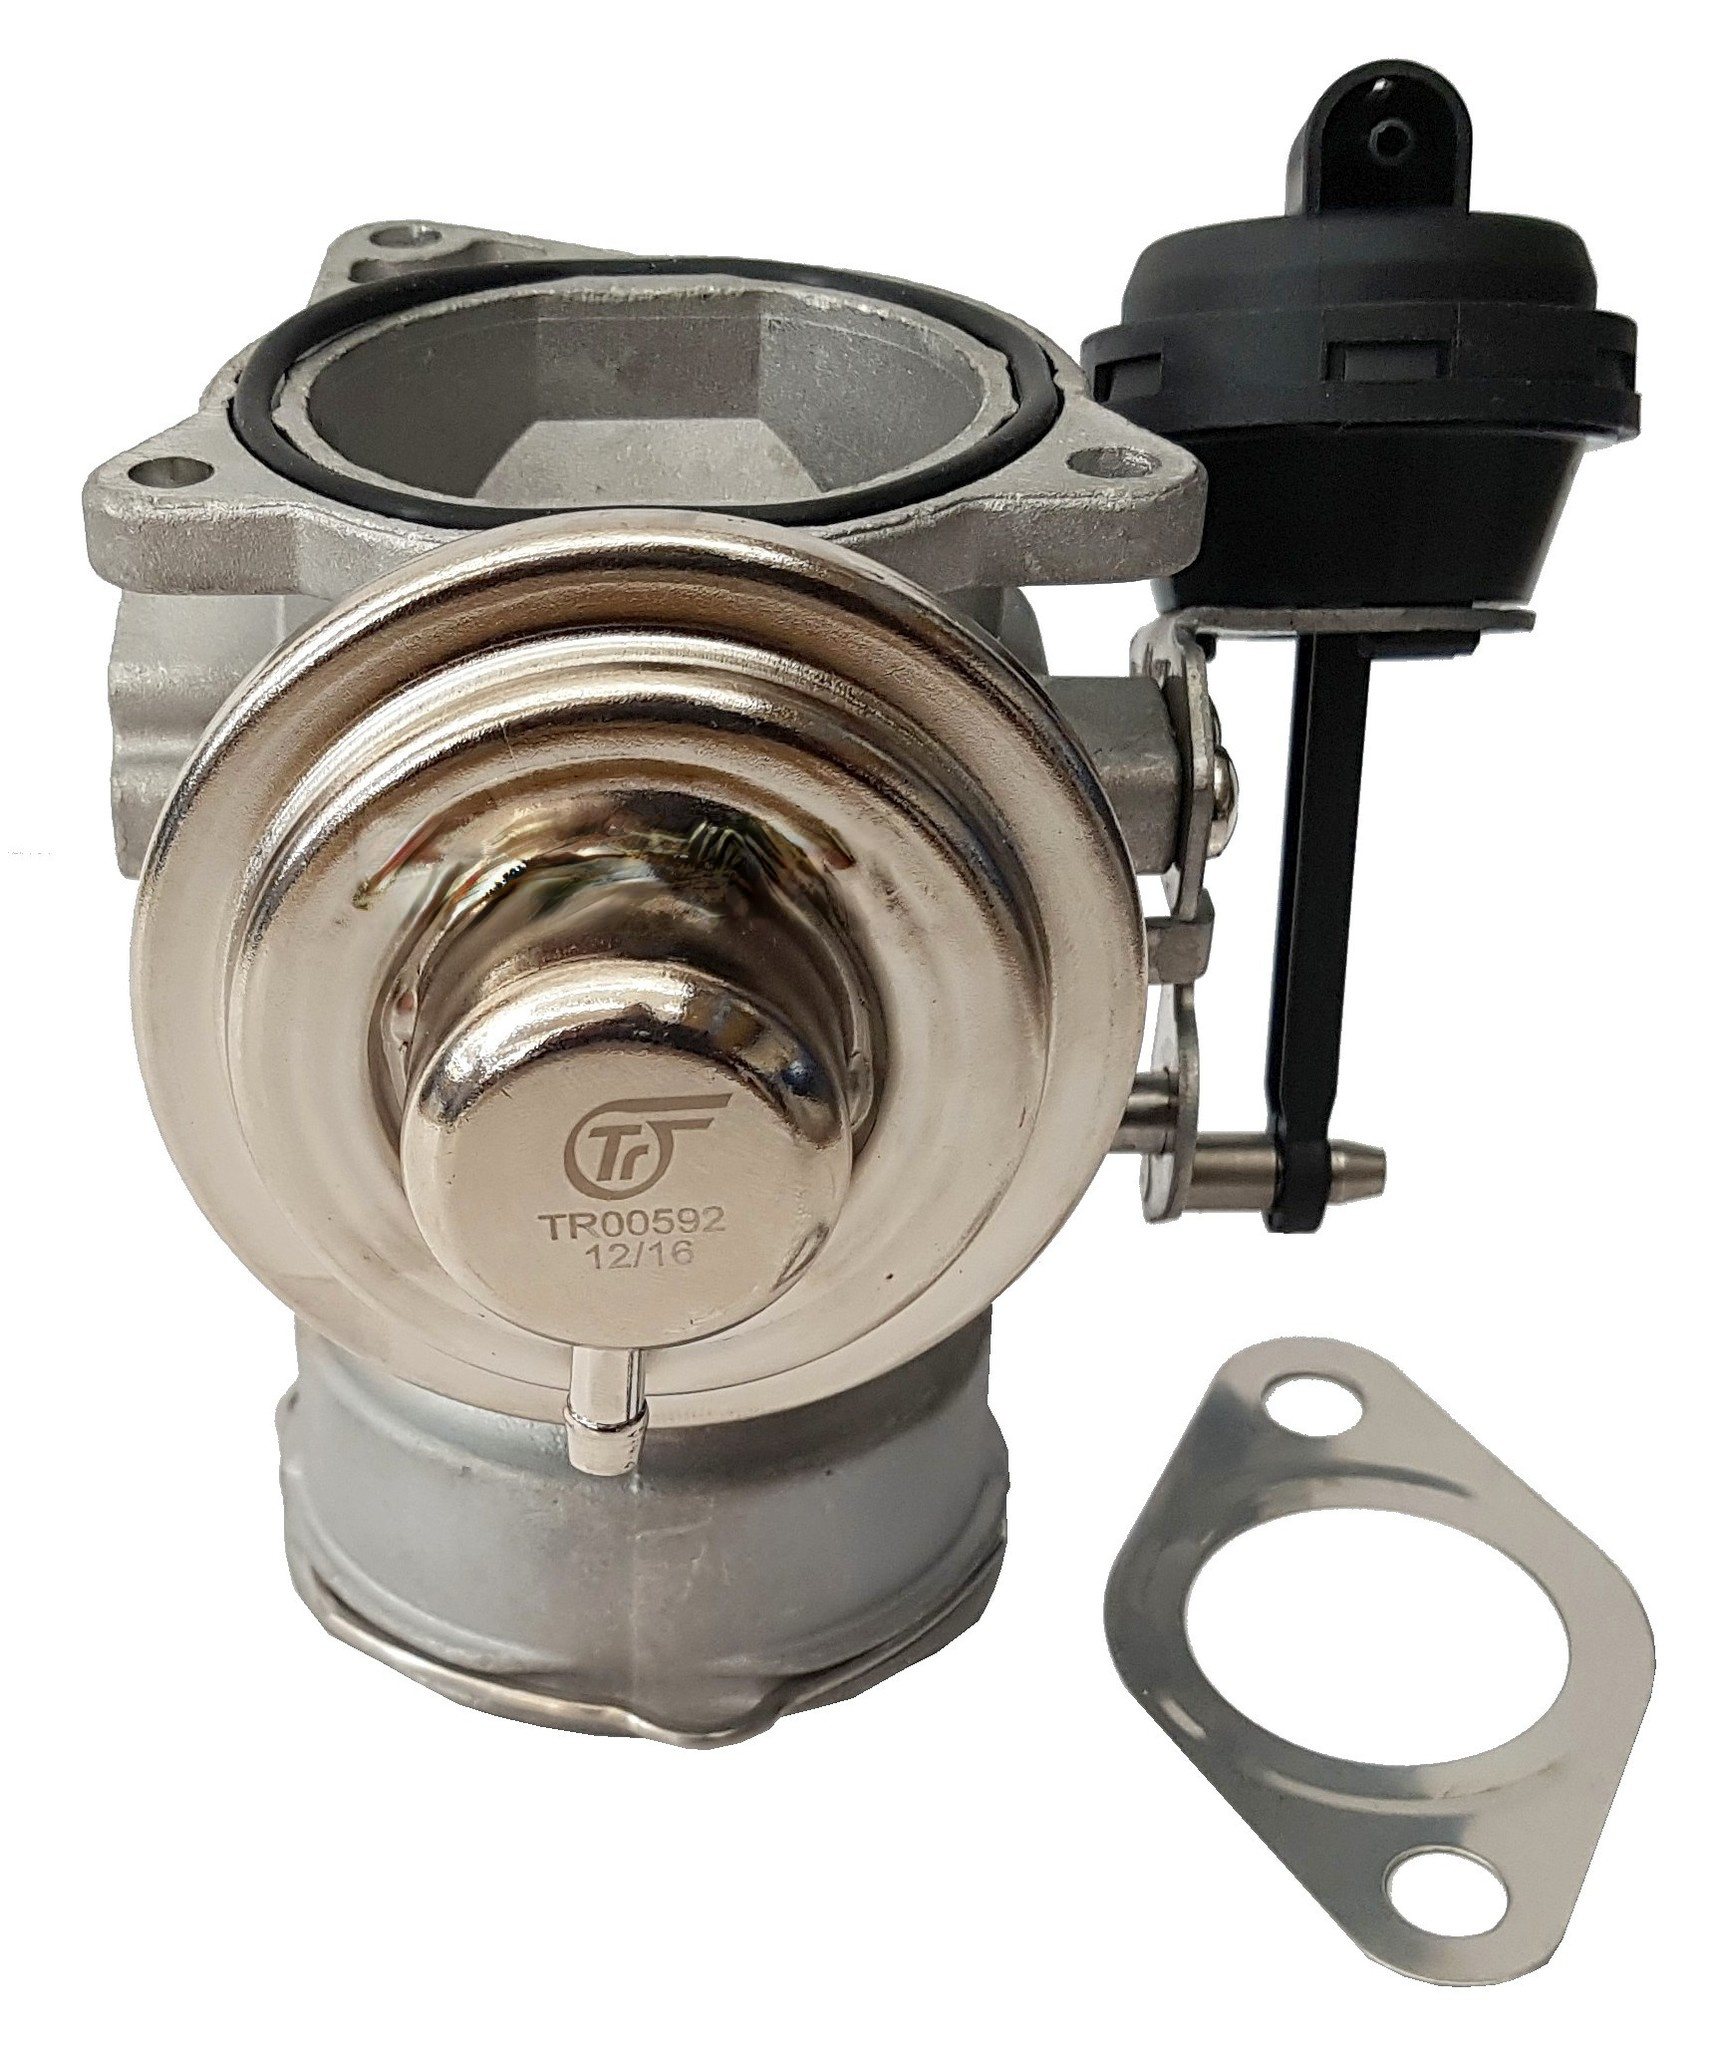 EGR ventil - TR00592 A4 Superb Passat 1.9TDi 96kW EGR/AGR ventily prémiové kvality